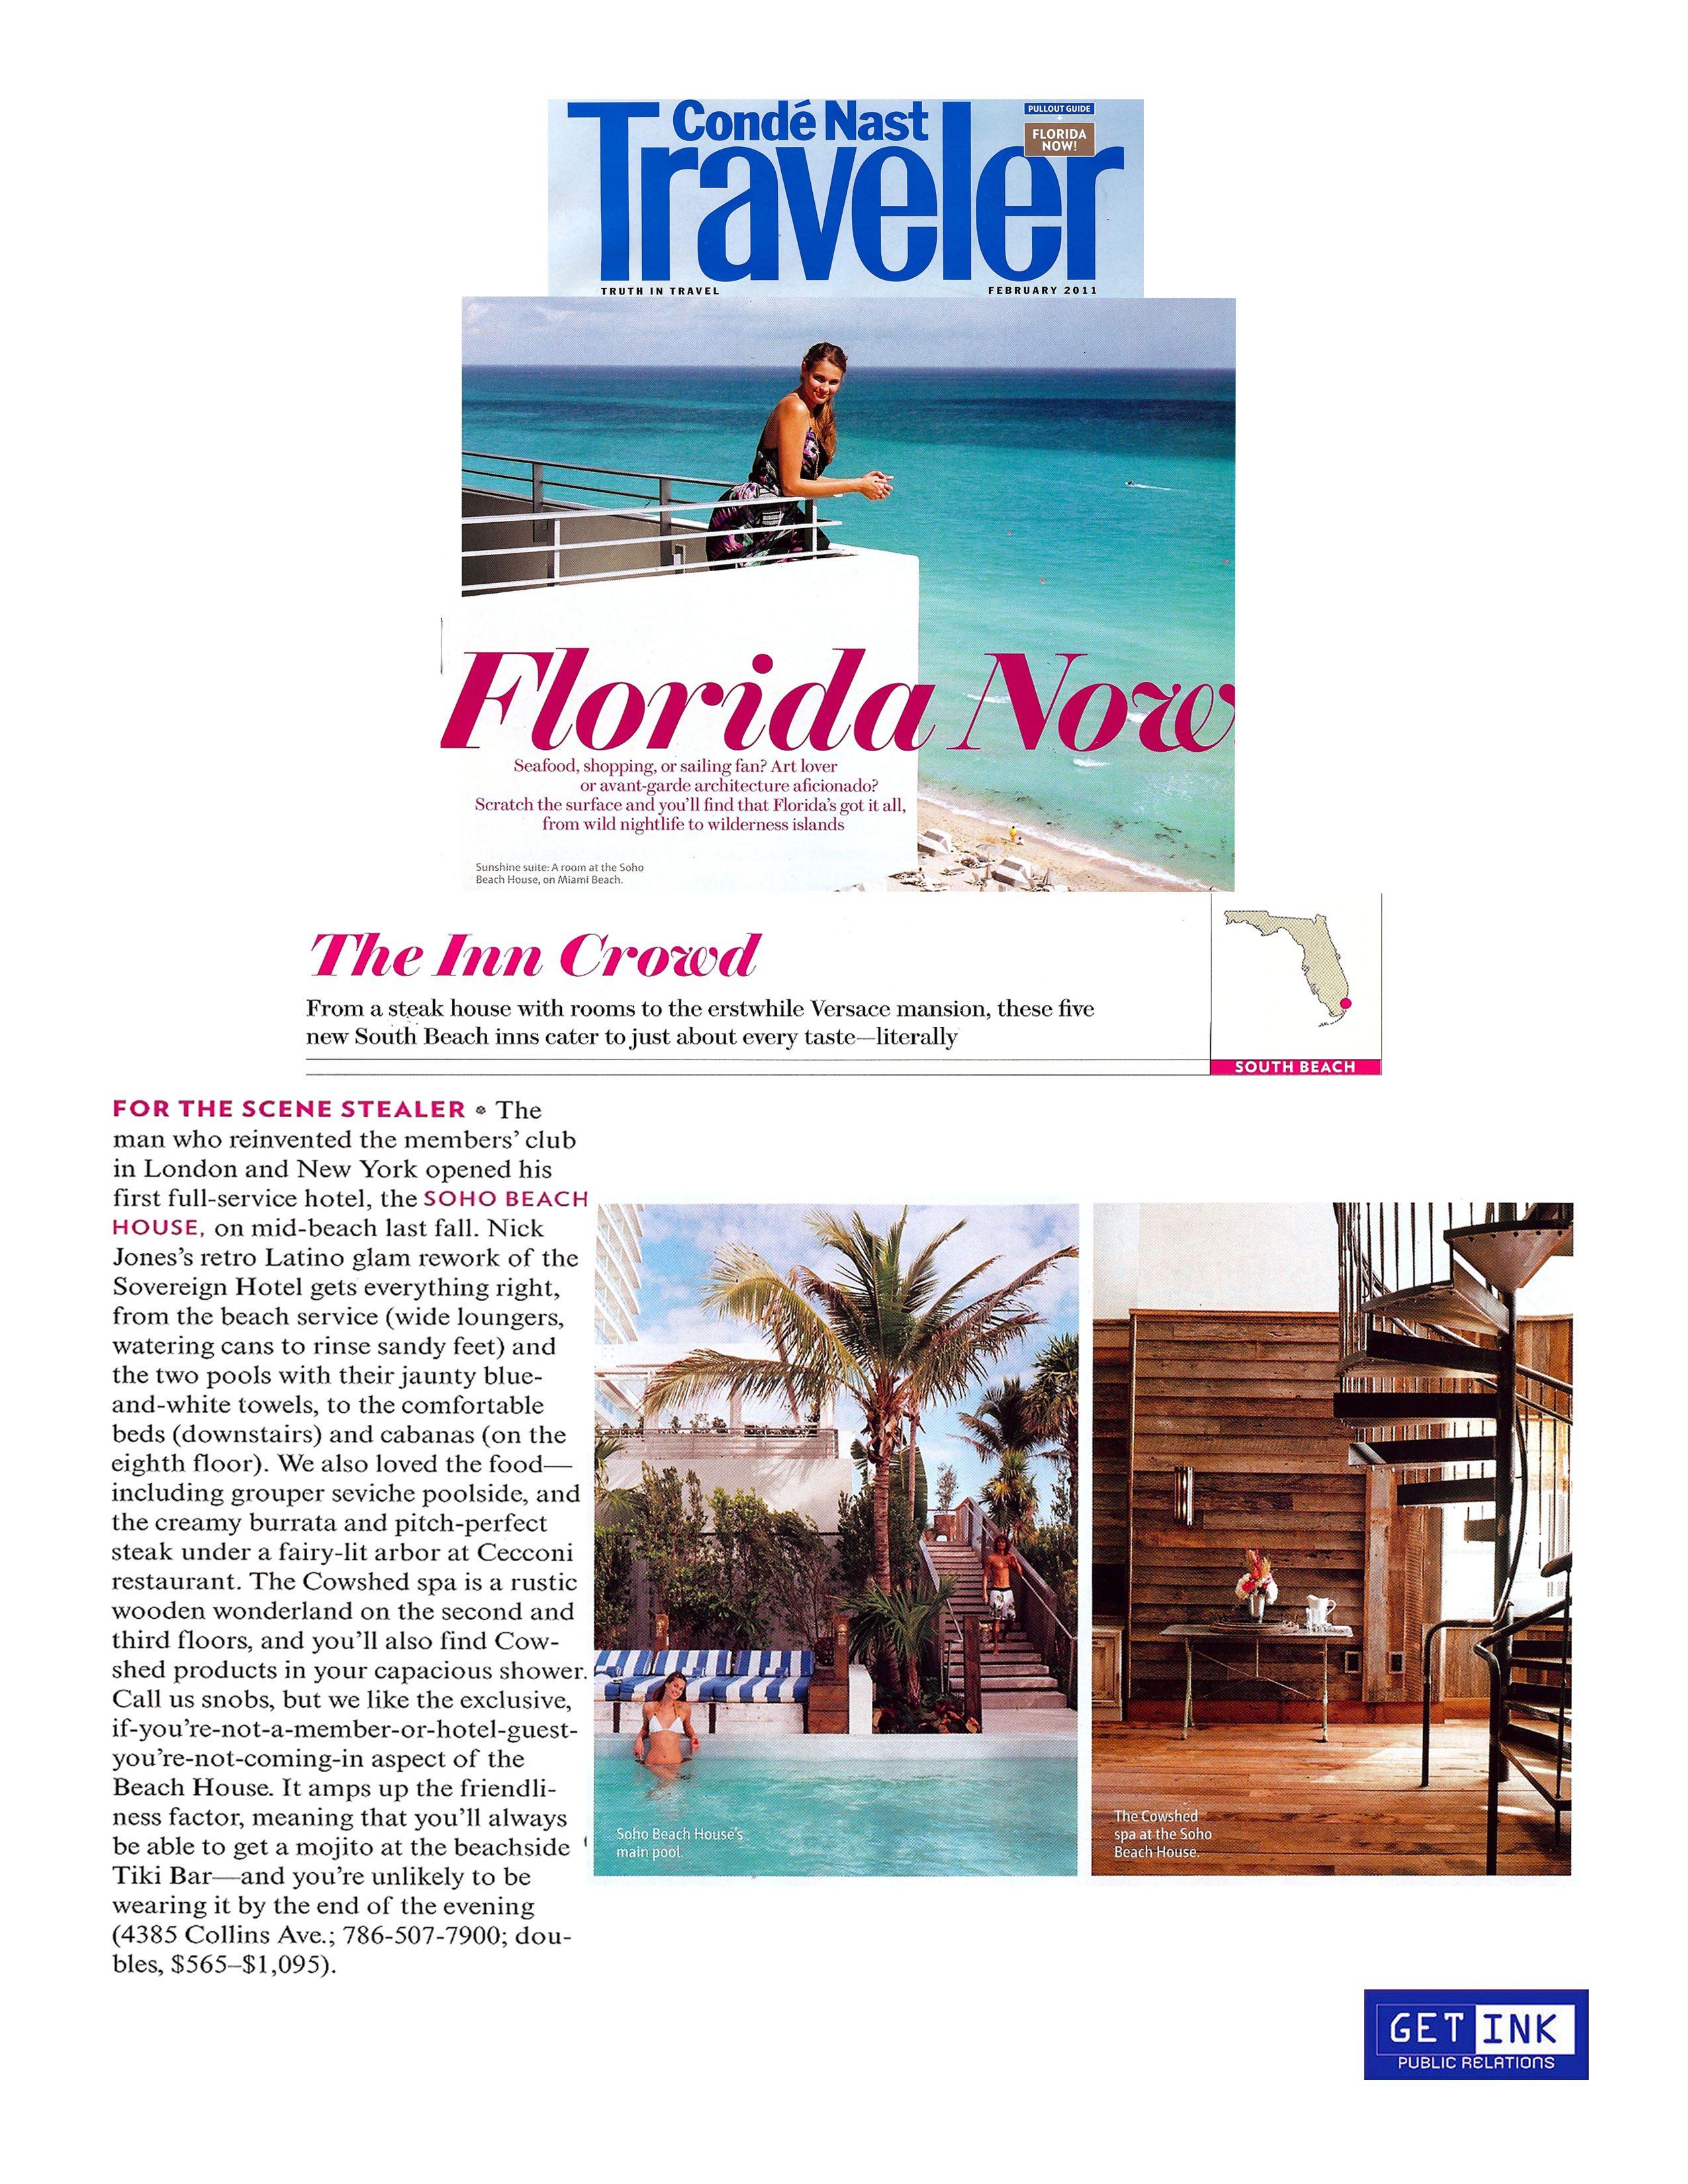 Soho Beach House Miami Beach in CondeNast Traveler - Get Ink PR